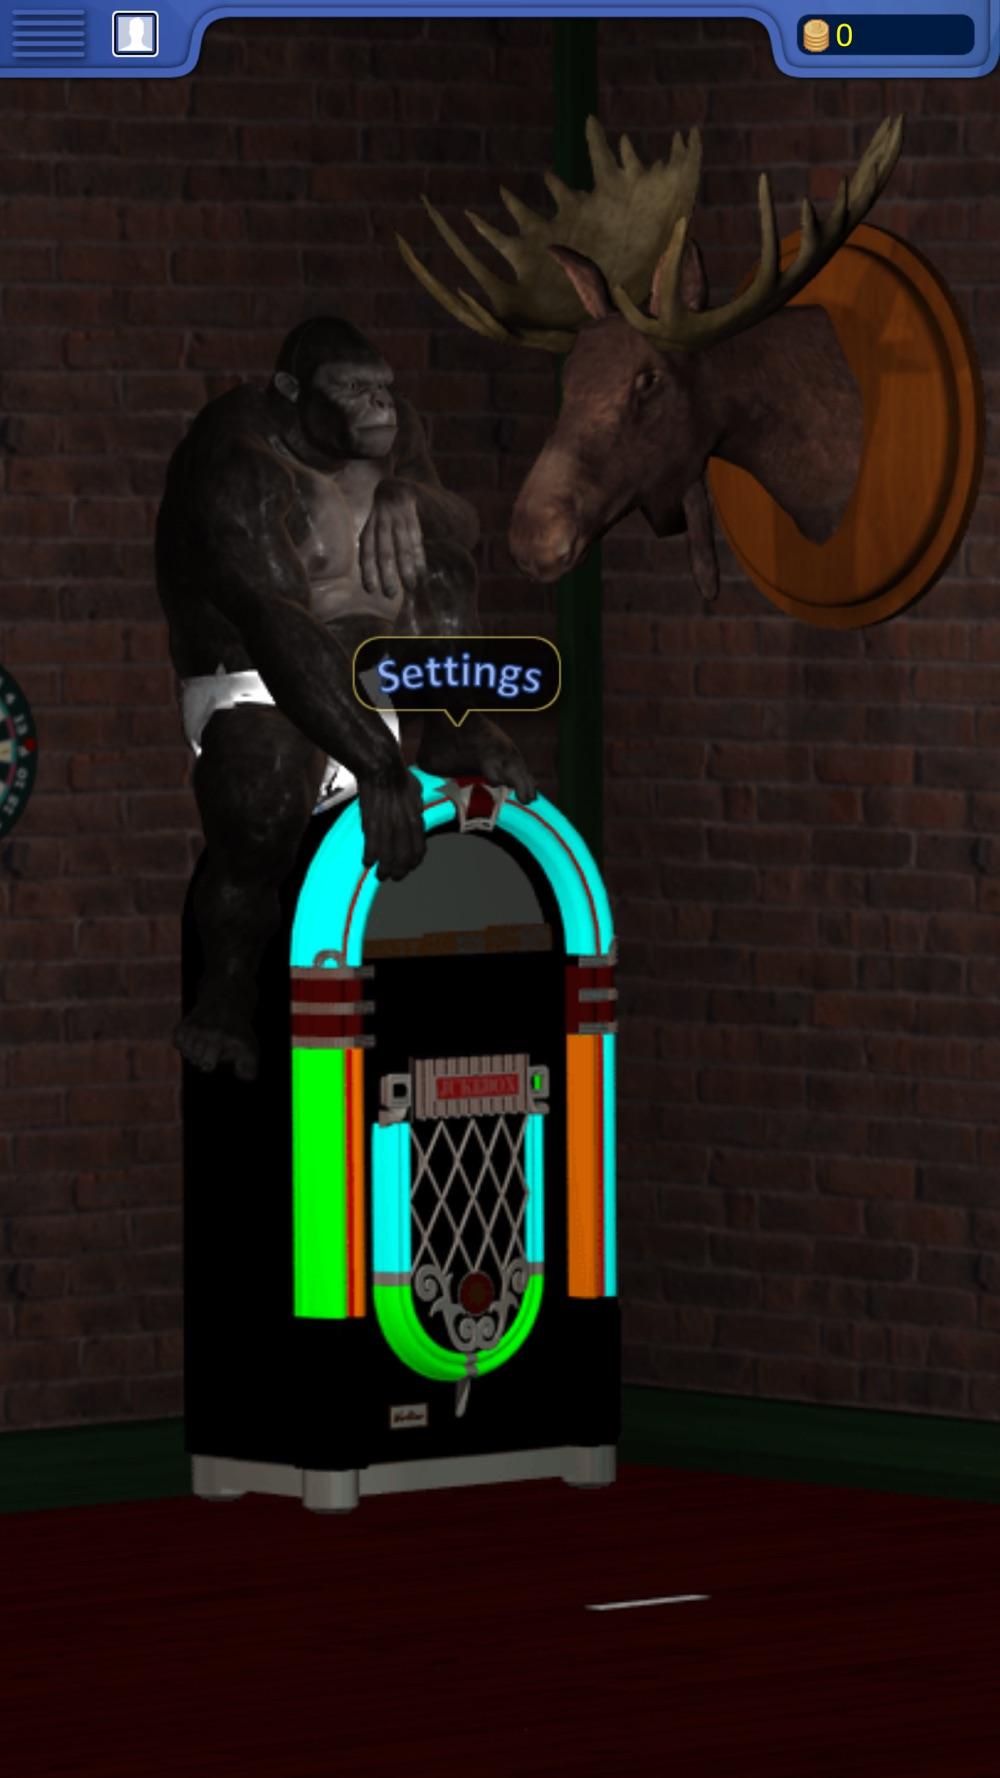 KNODAT? – The Fun Free Bar Trivia Game Cheat Codes